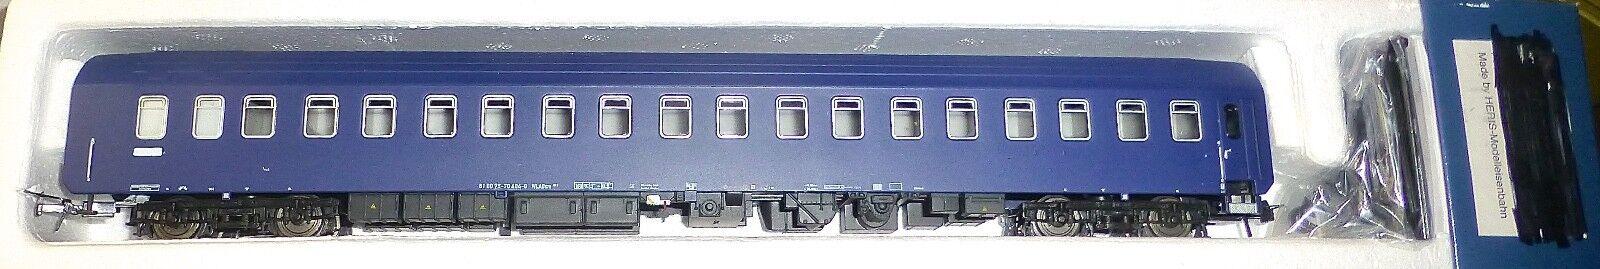 WLABsm Schlafwagen 61 80 75-70 404-8 HERIS 11282 H0 1 87 B2B2 å